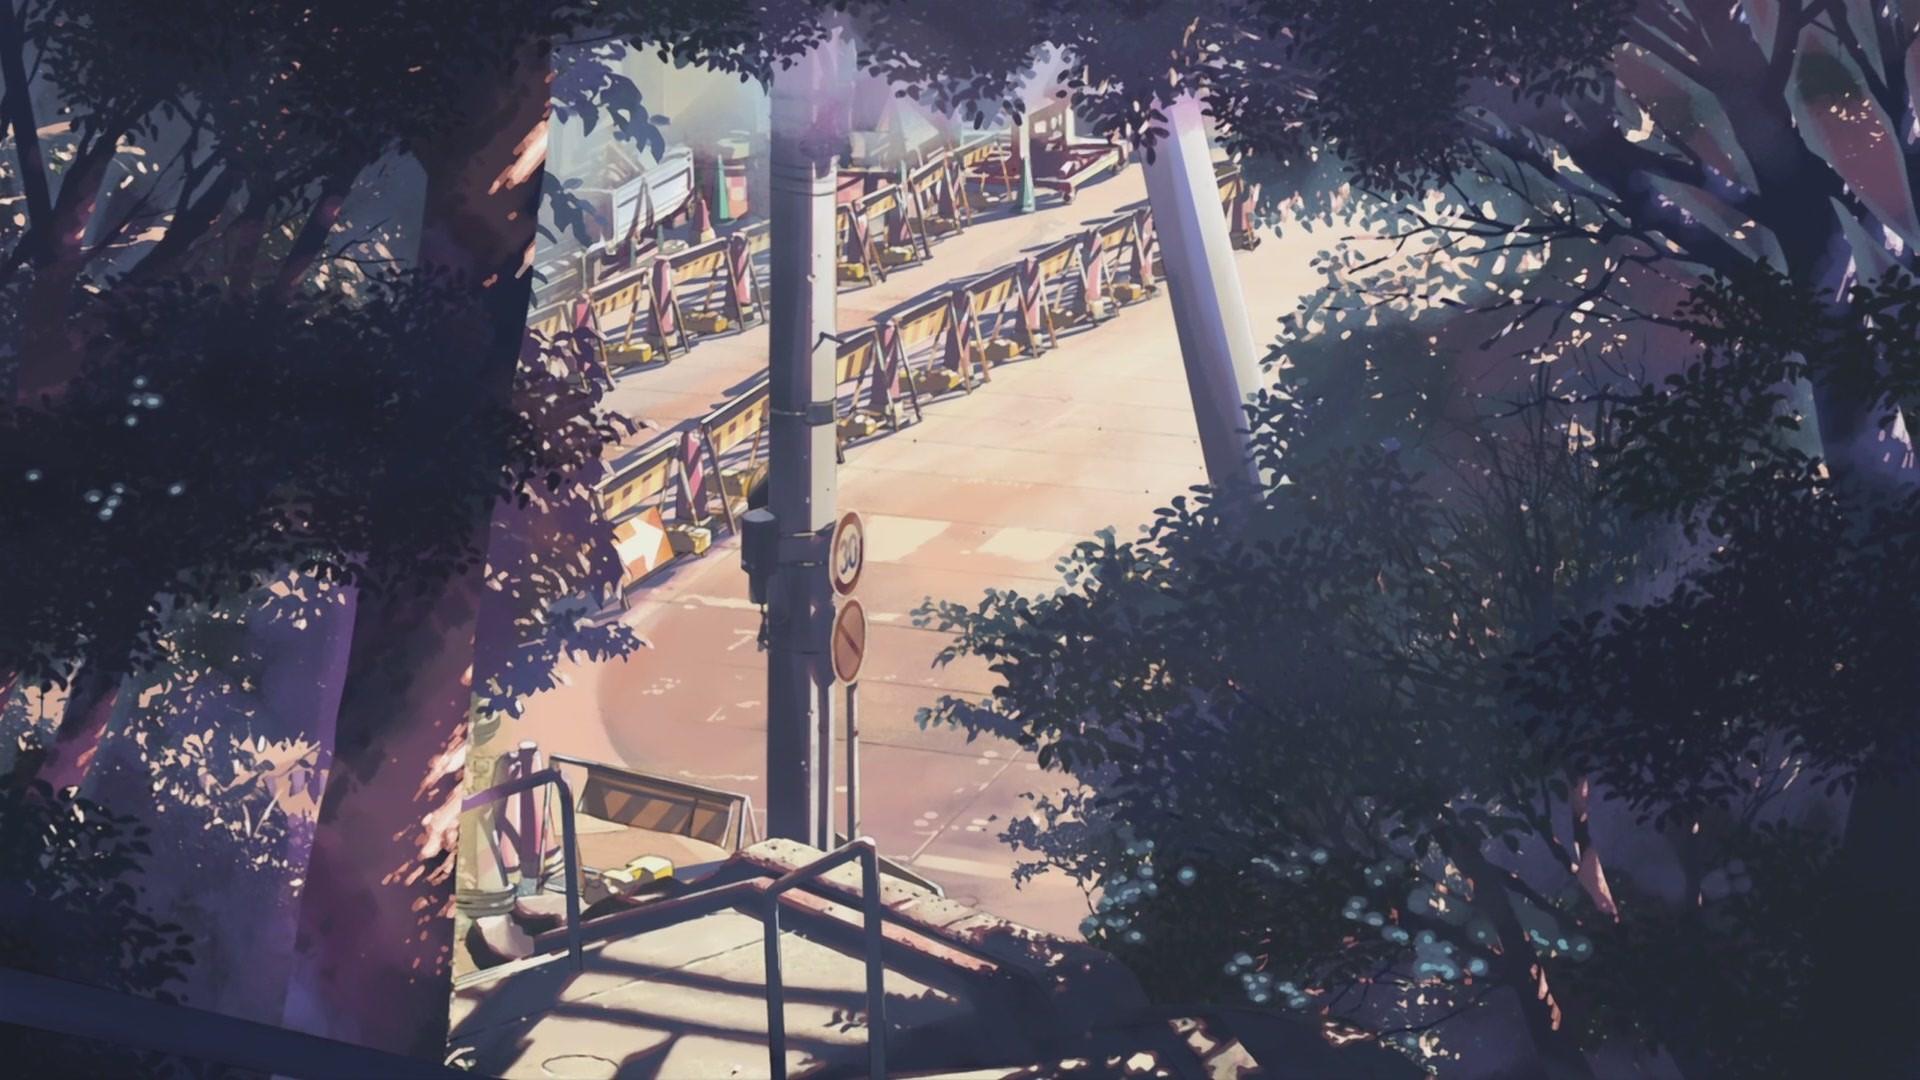 Anime 1920x1080 trees 5 Centimeters Per Second artwork Makoto Shinkai  anime